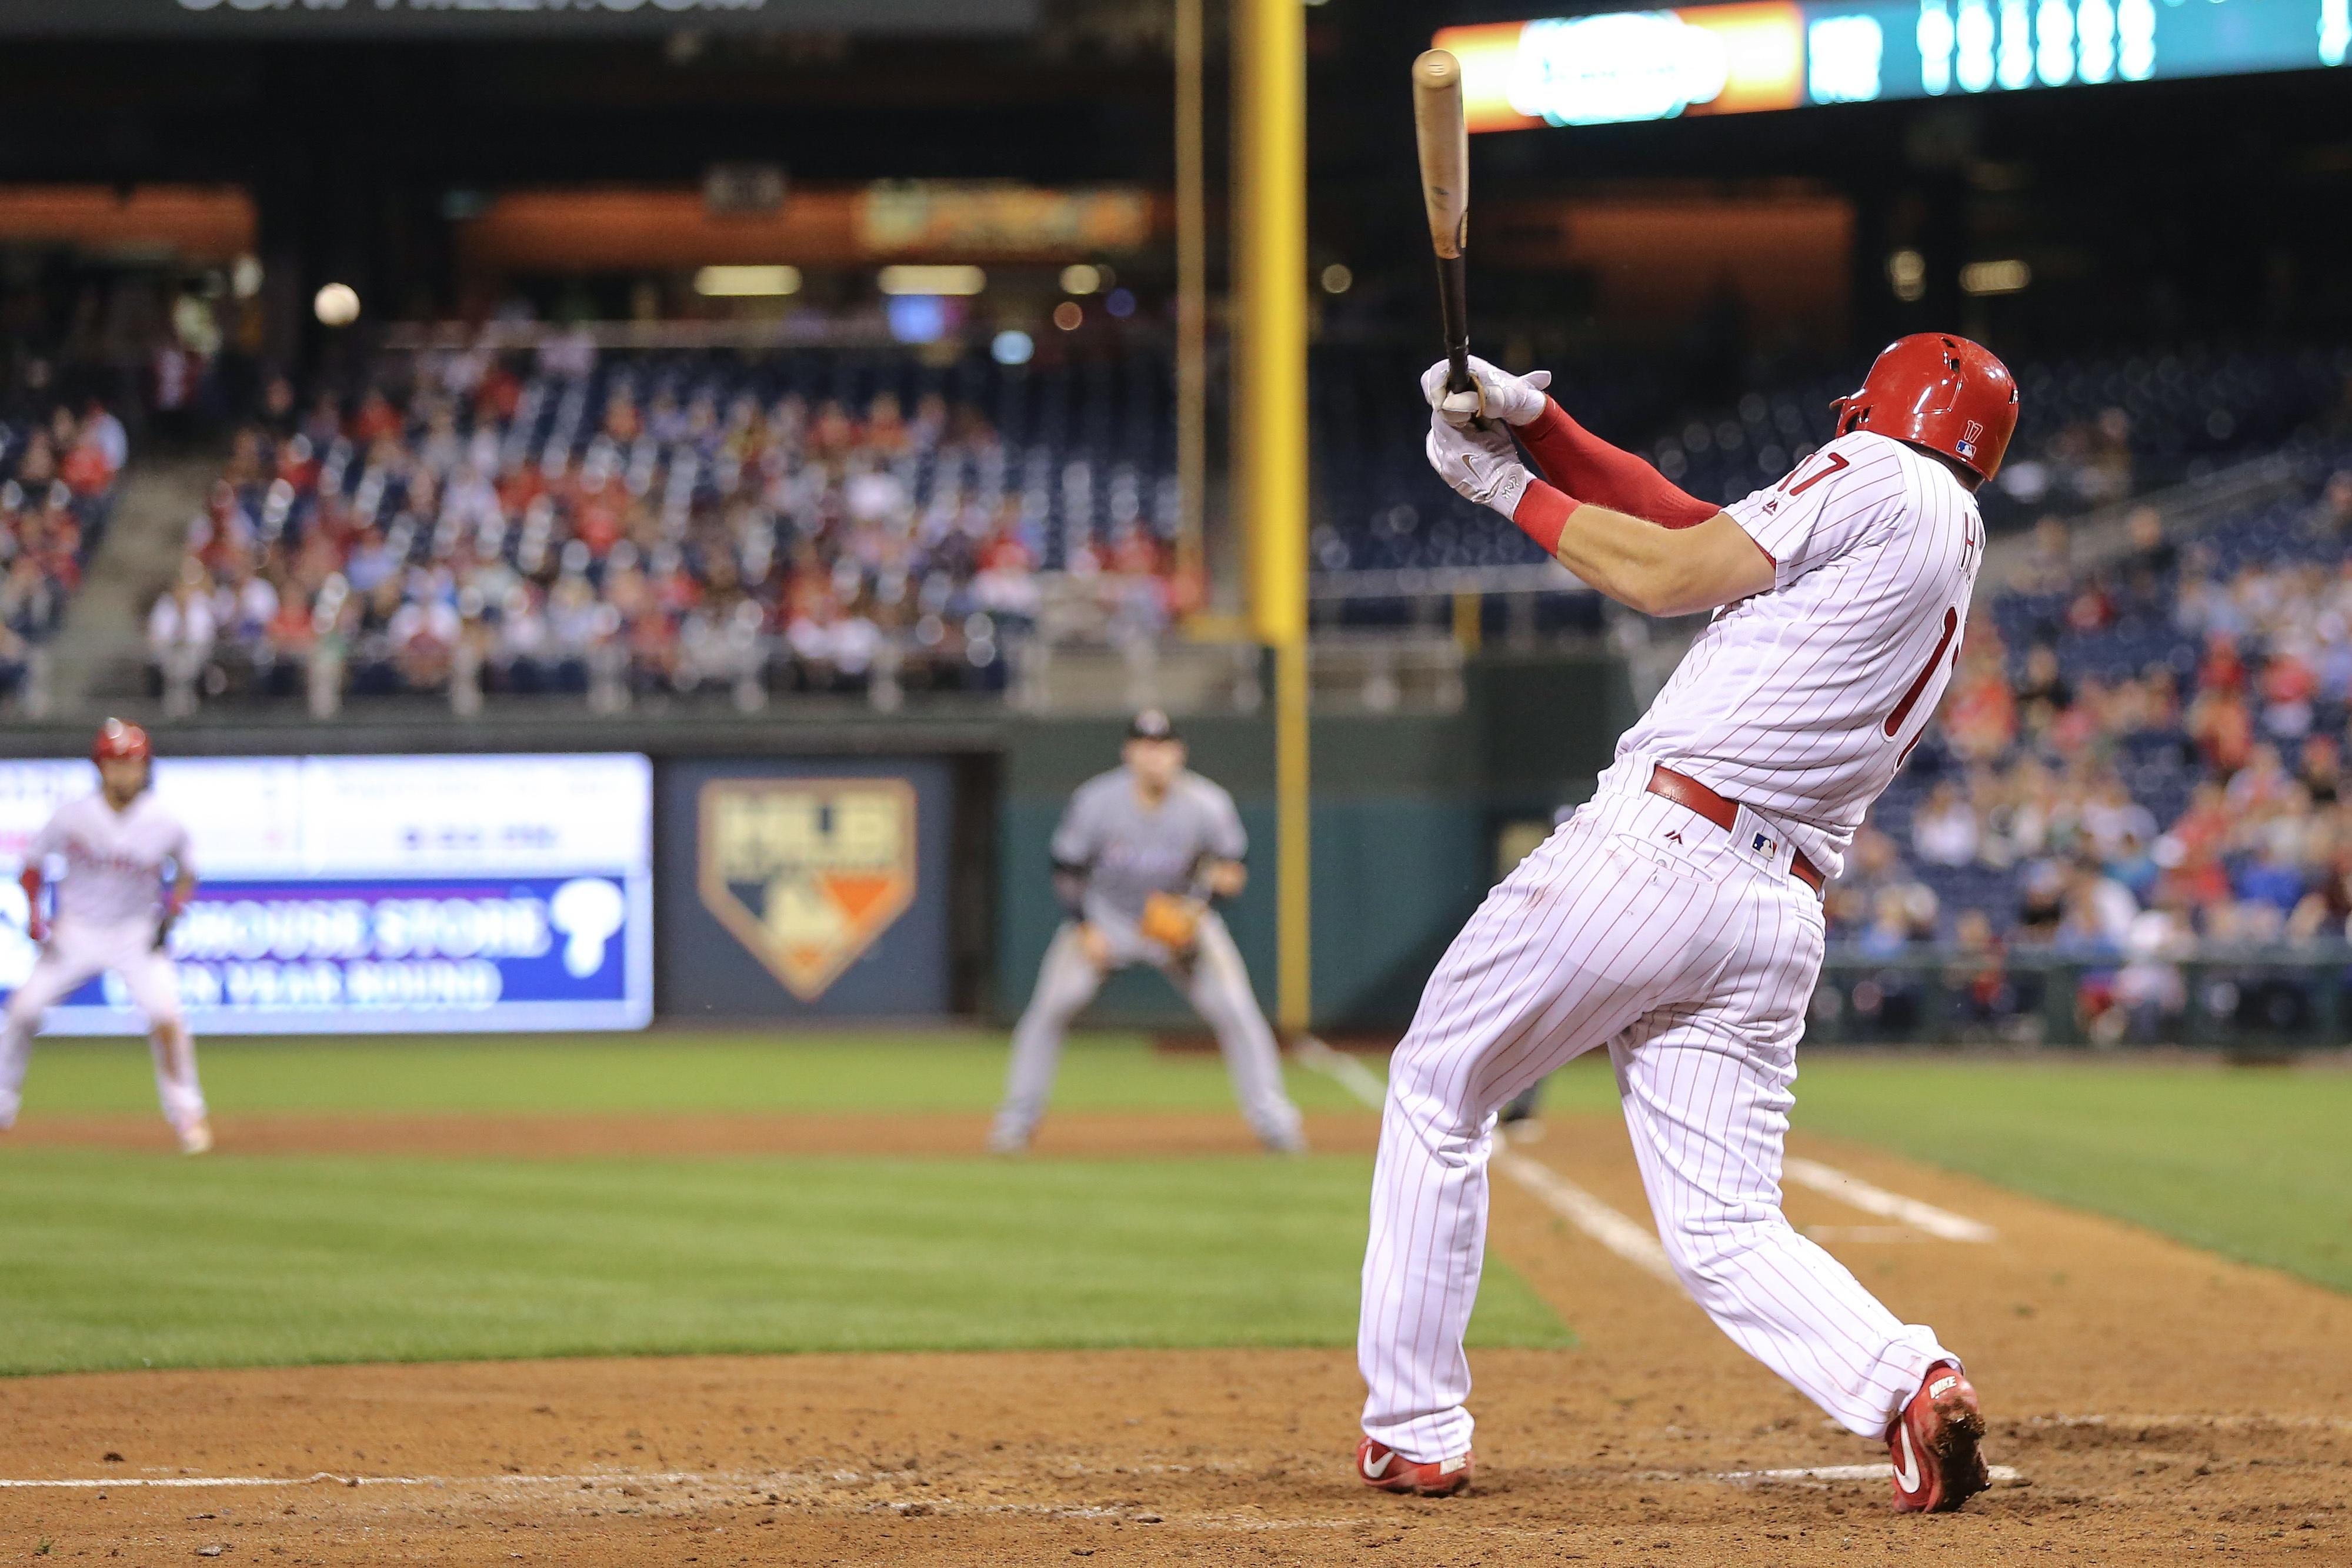 Phillies rookie slugger Rhys Hoskins has seven home runs in nine games against the Marlins this season.(Steven M. Falk/Philadelphia Inquirer/TNS)